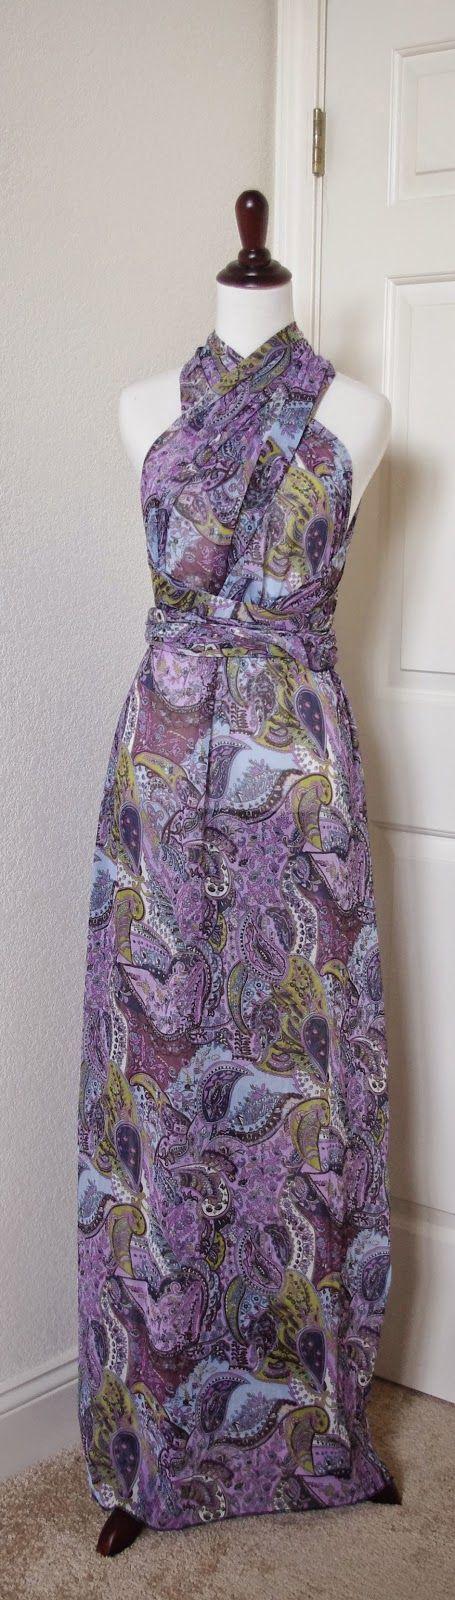 SewPetiteGal: Easy Infinity Maxi Dress DIY Tutorial